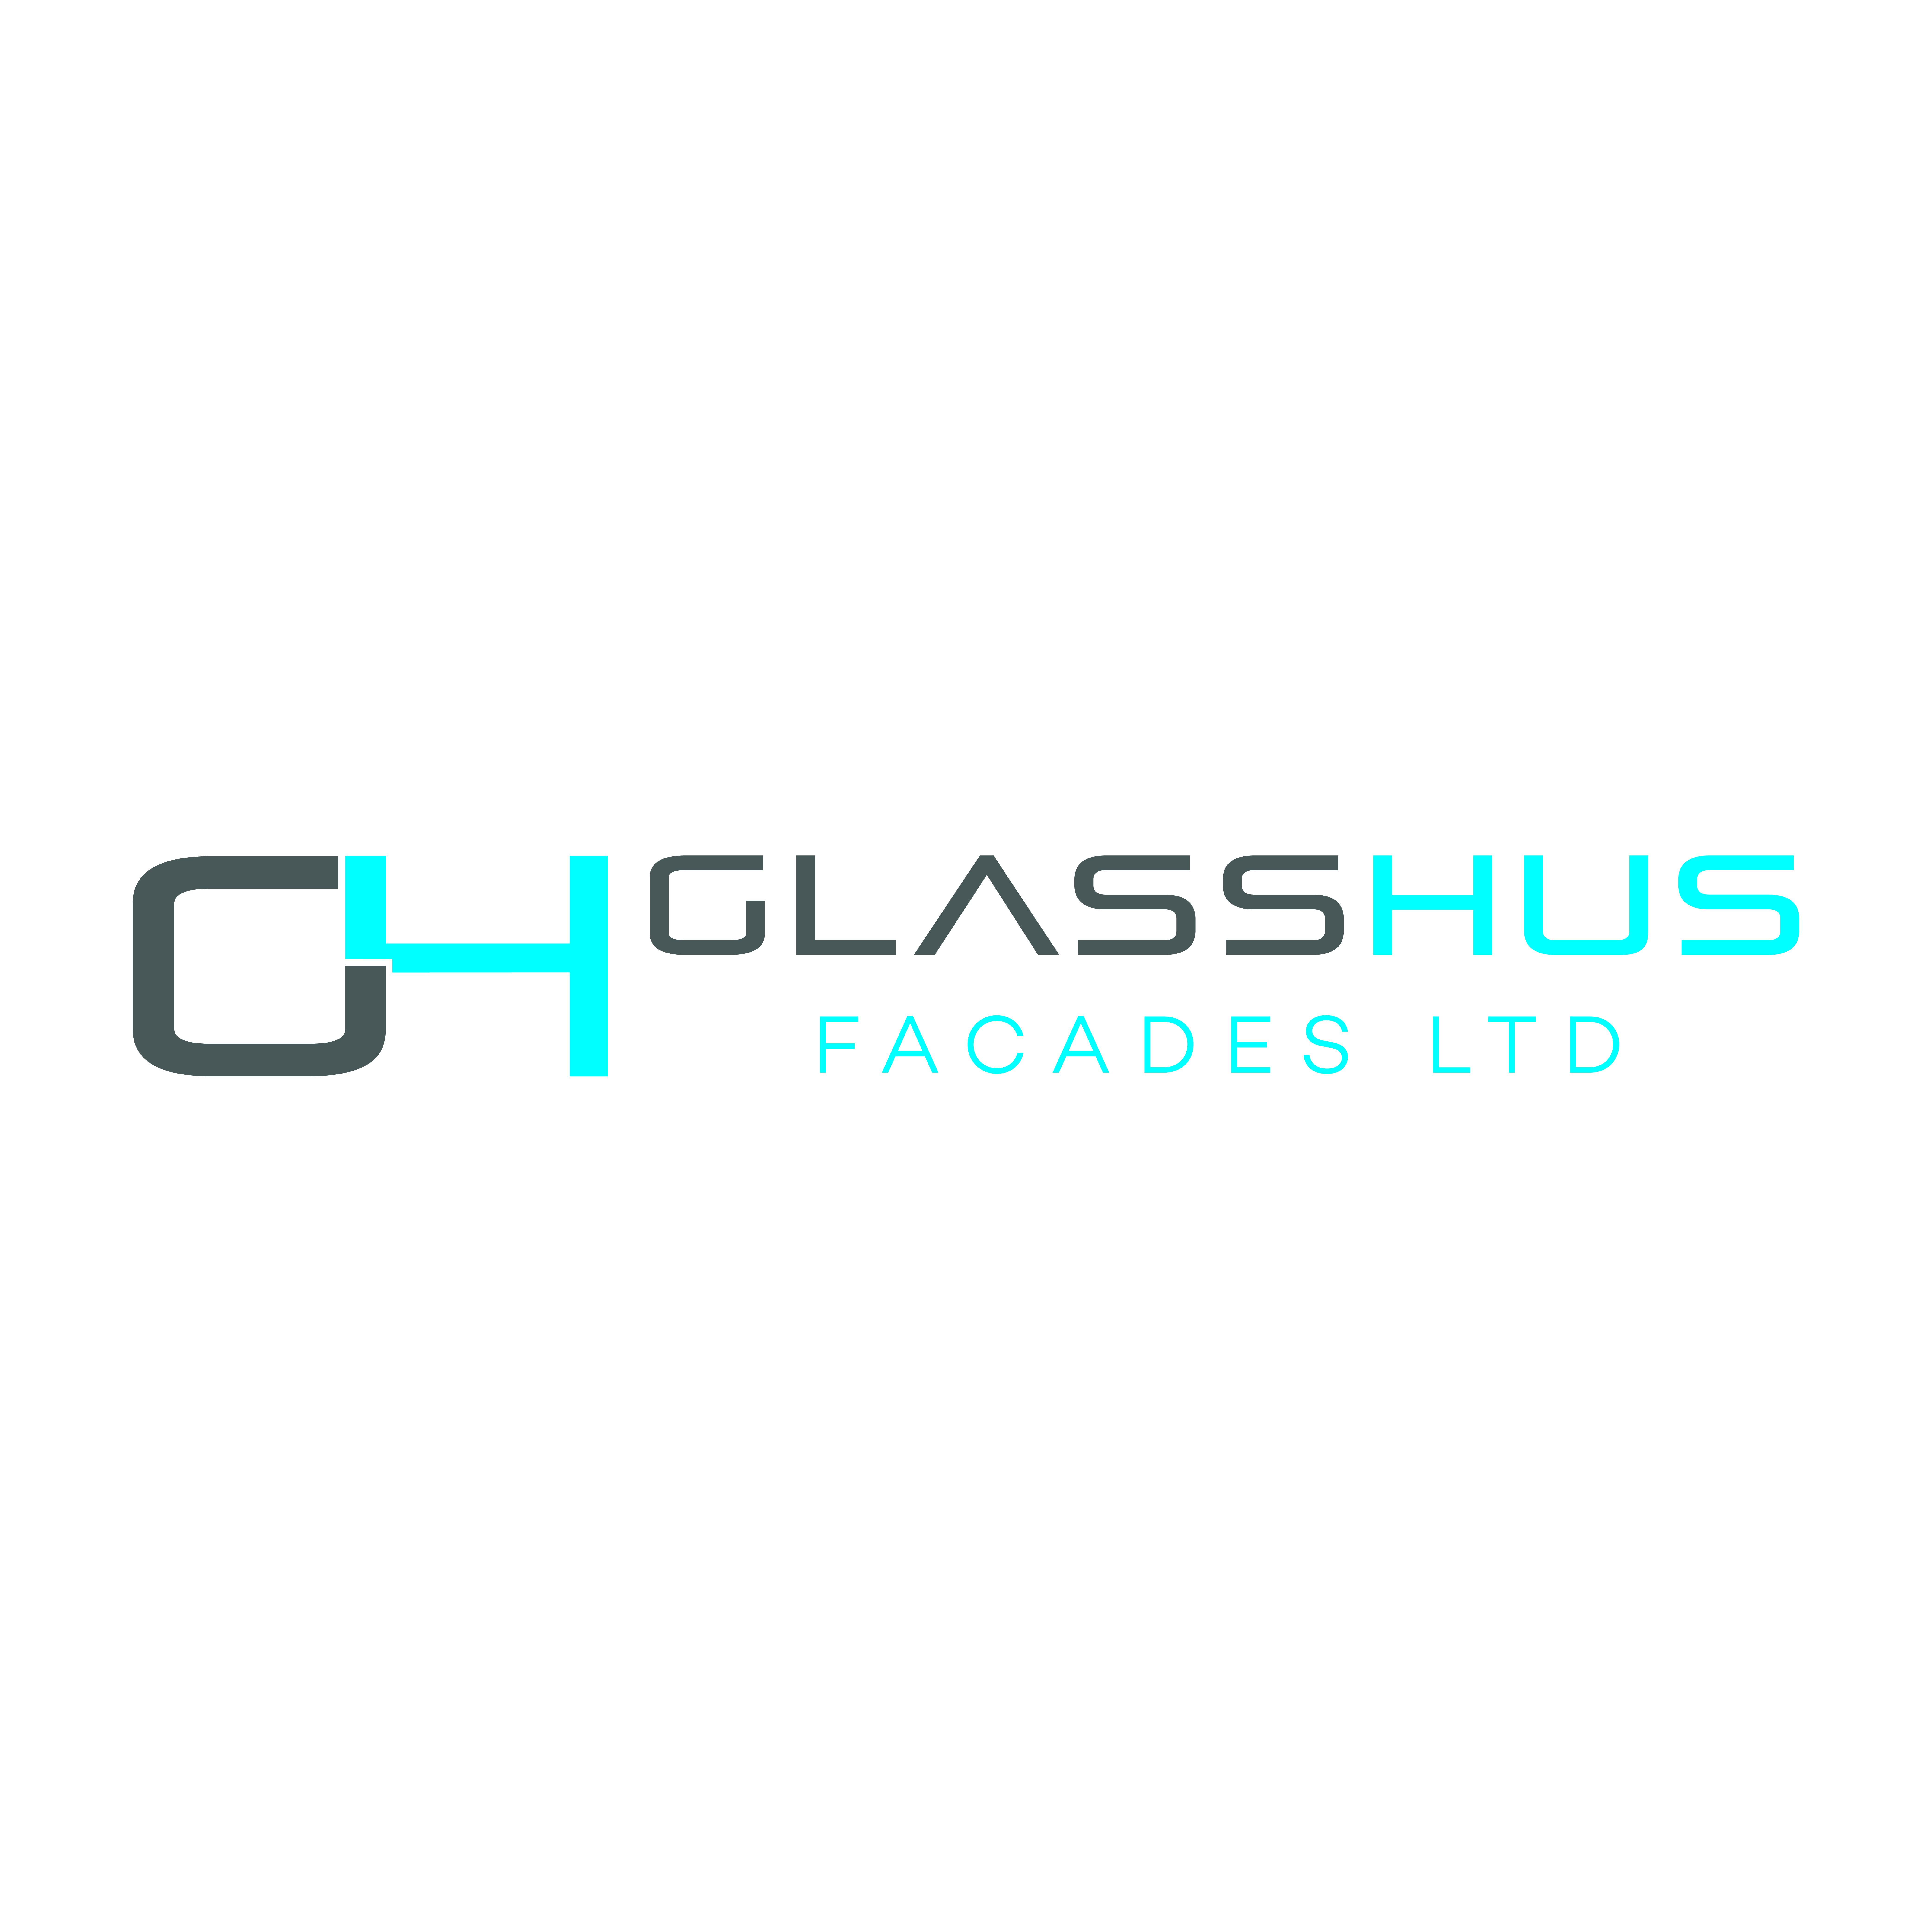 Glasshus Facades Ltd